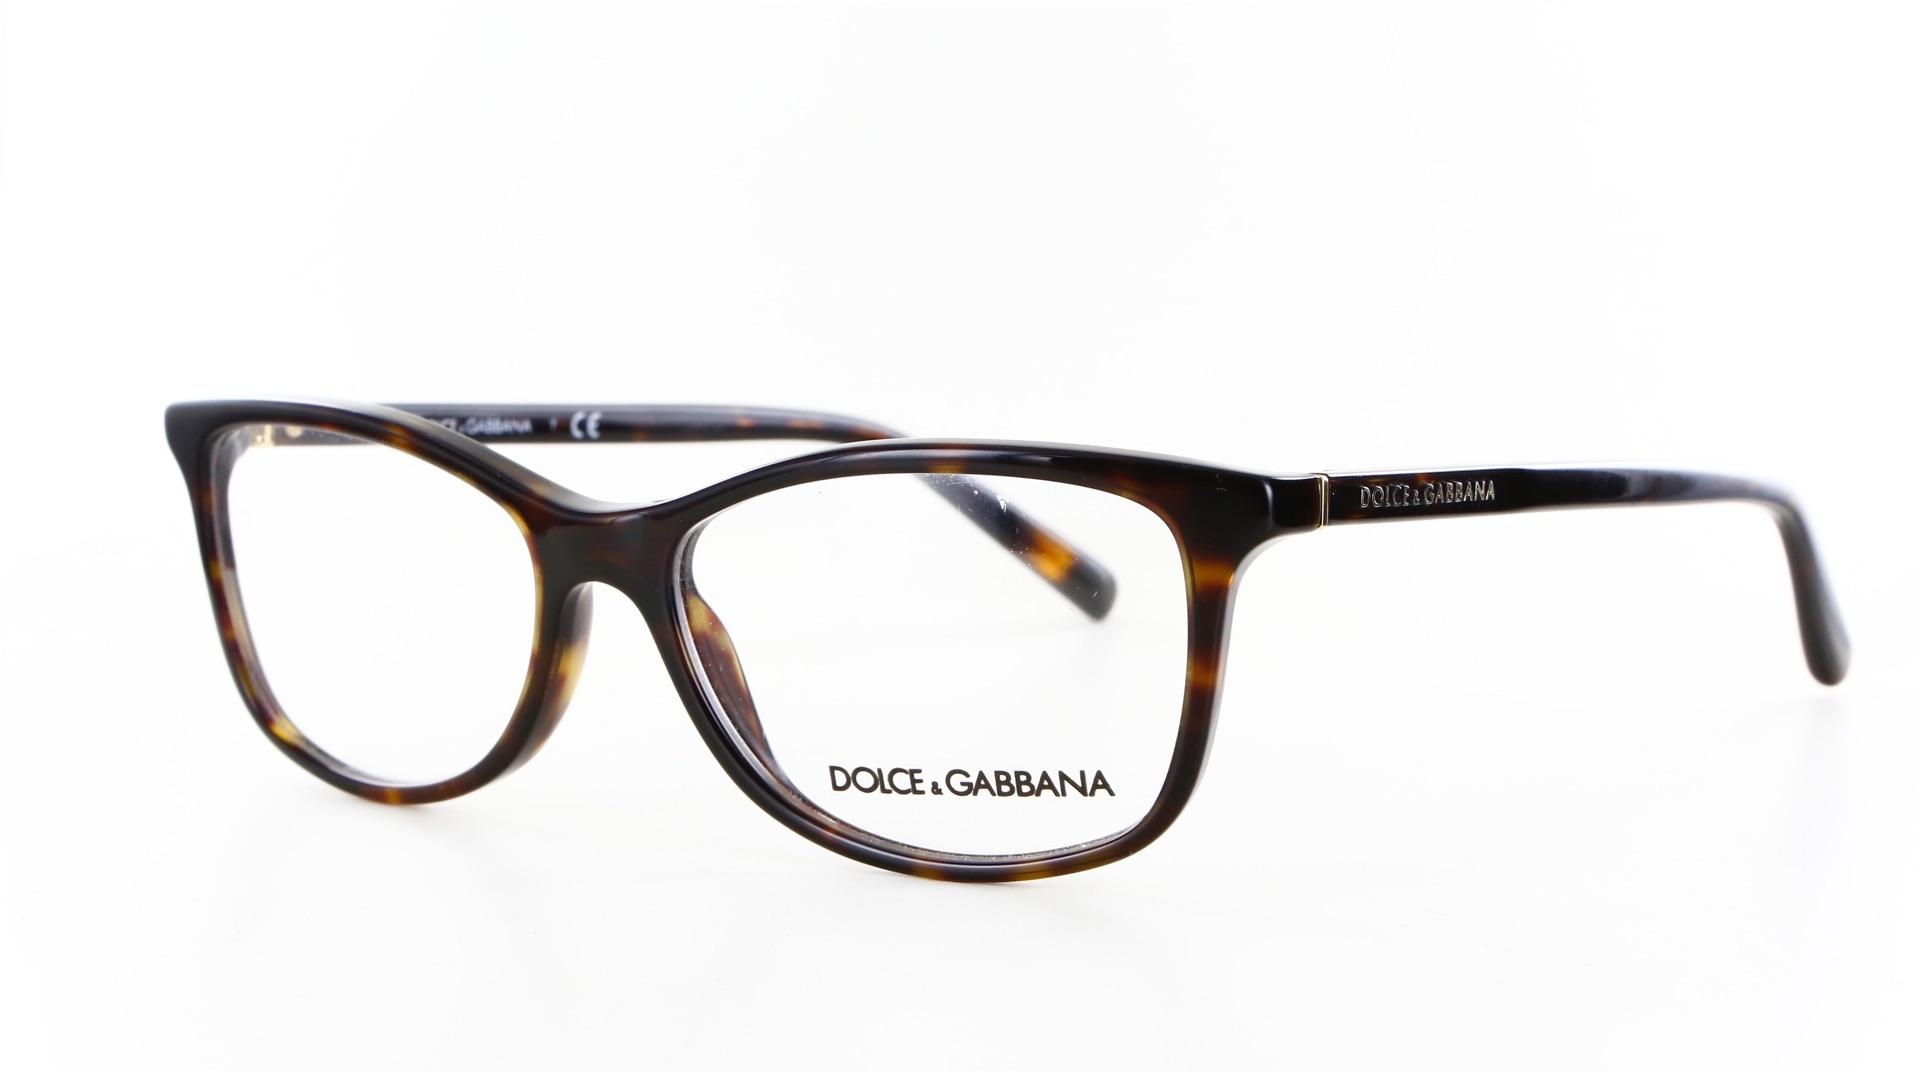 Dolce & Gabbana - ref: 74385